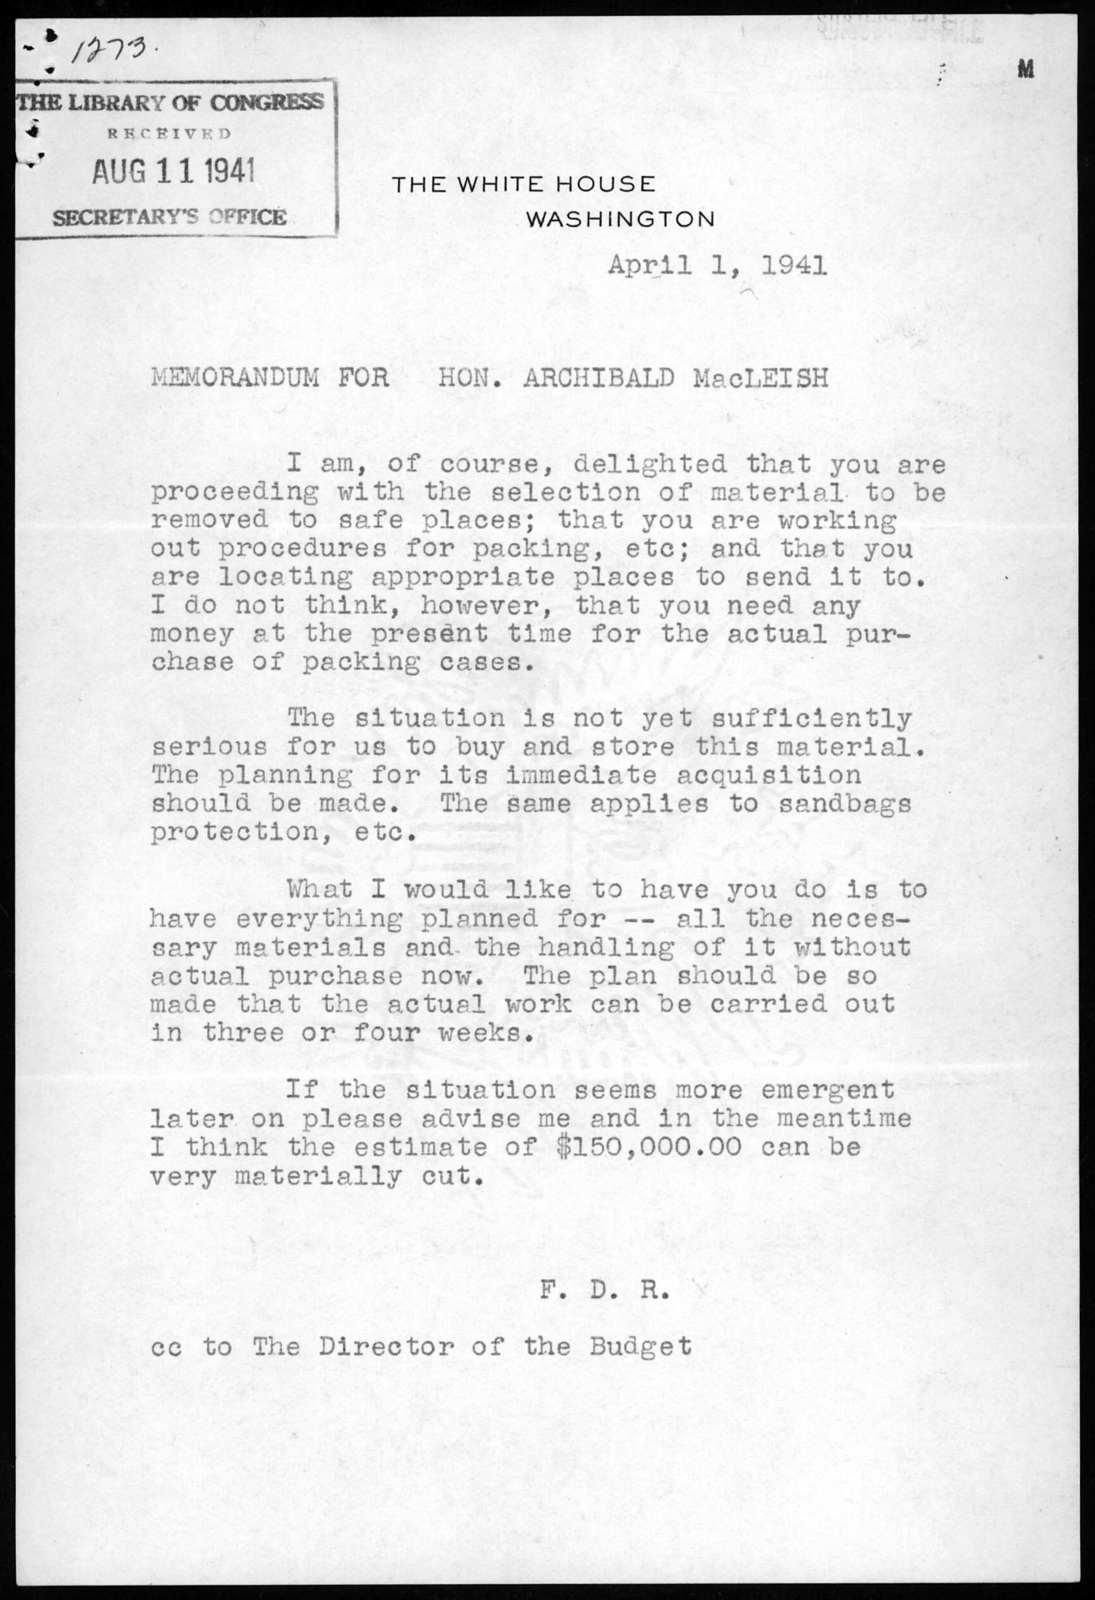 Memorandum from Franklin D. Roosevelt to Archibald MacLeish, April 1, 1941